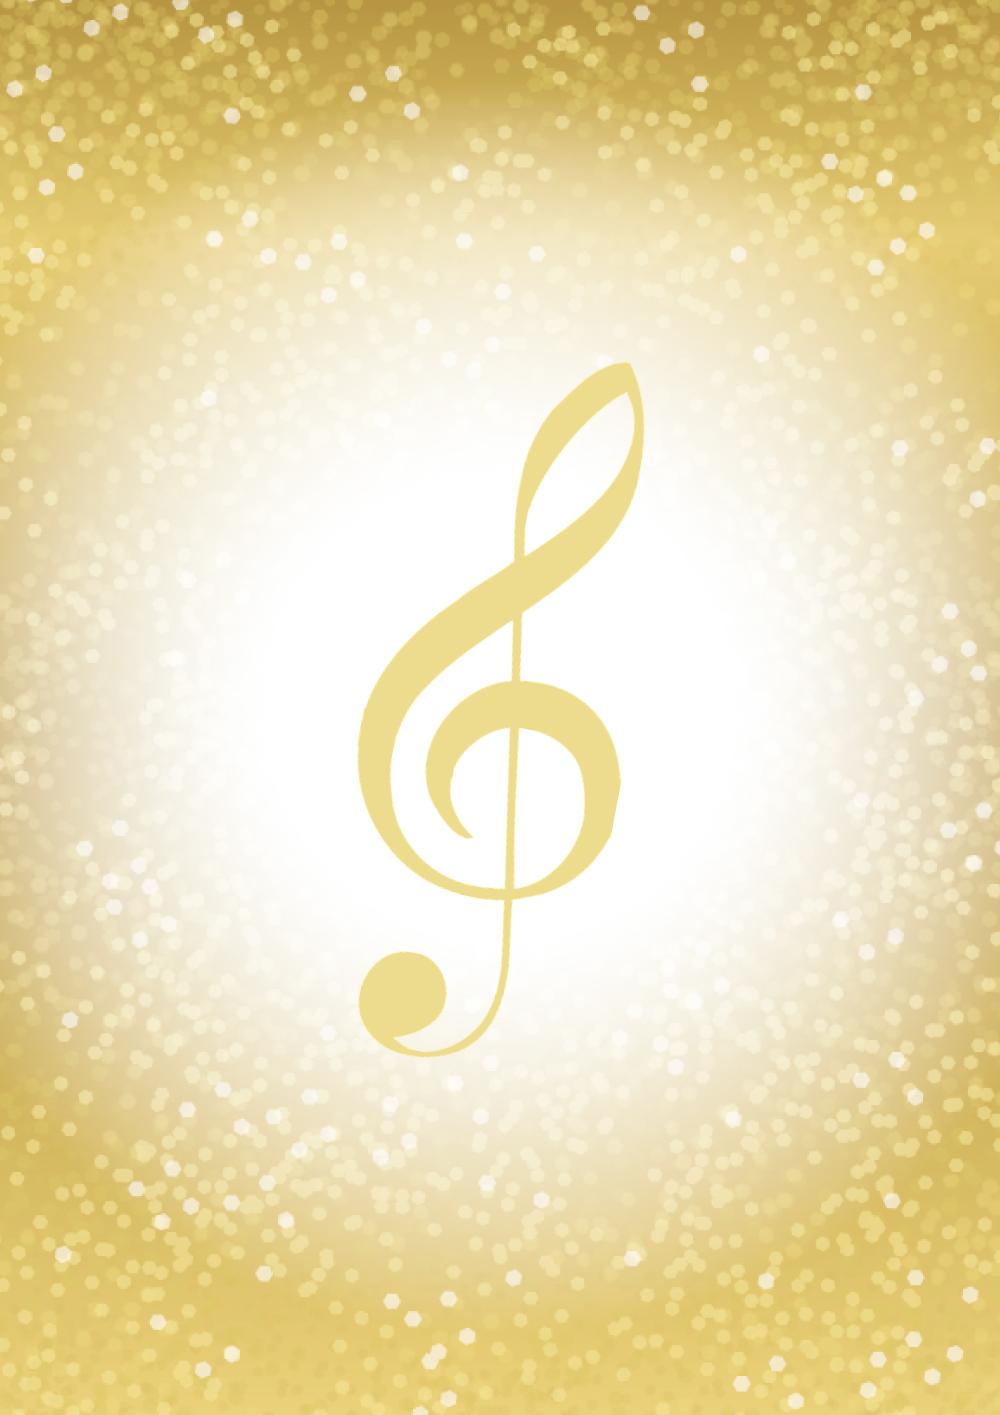 Gold G-clef 2